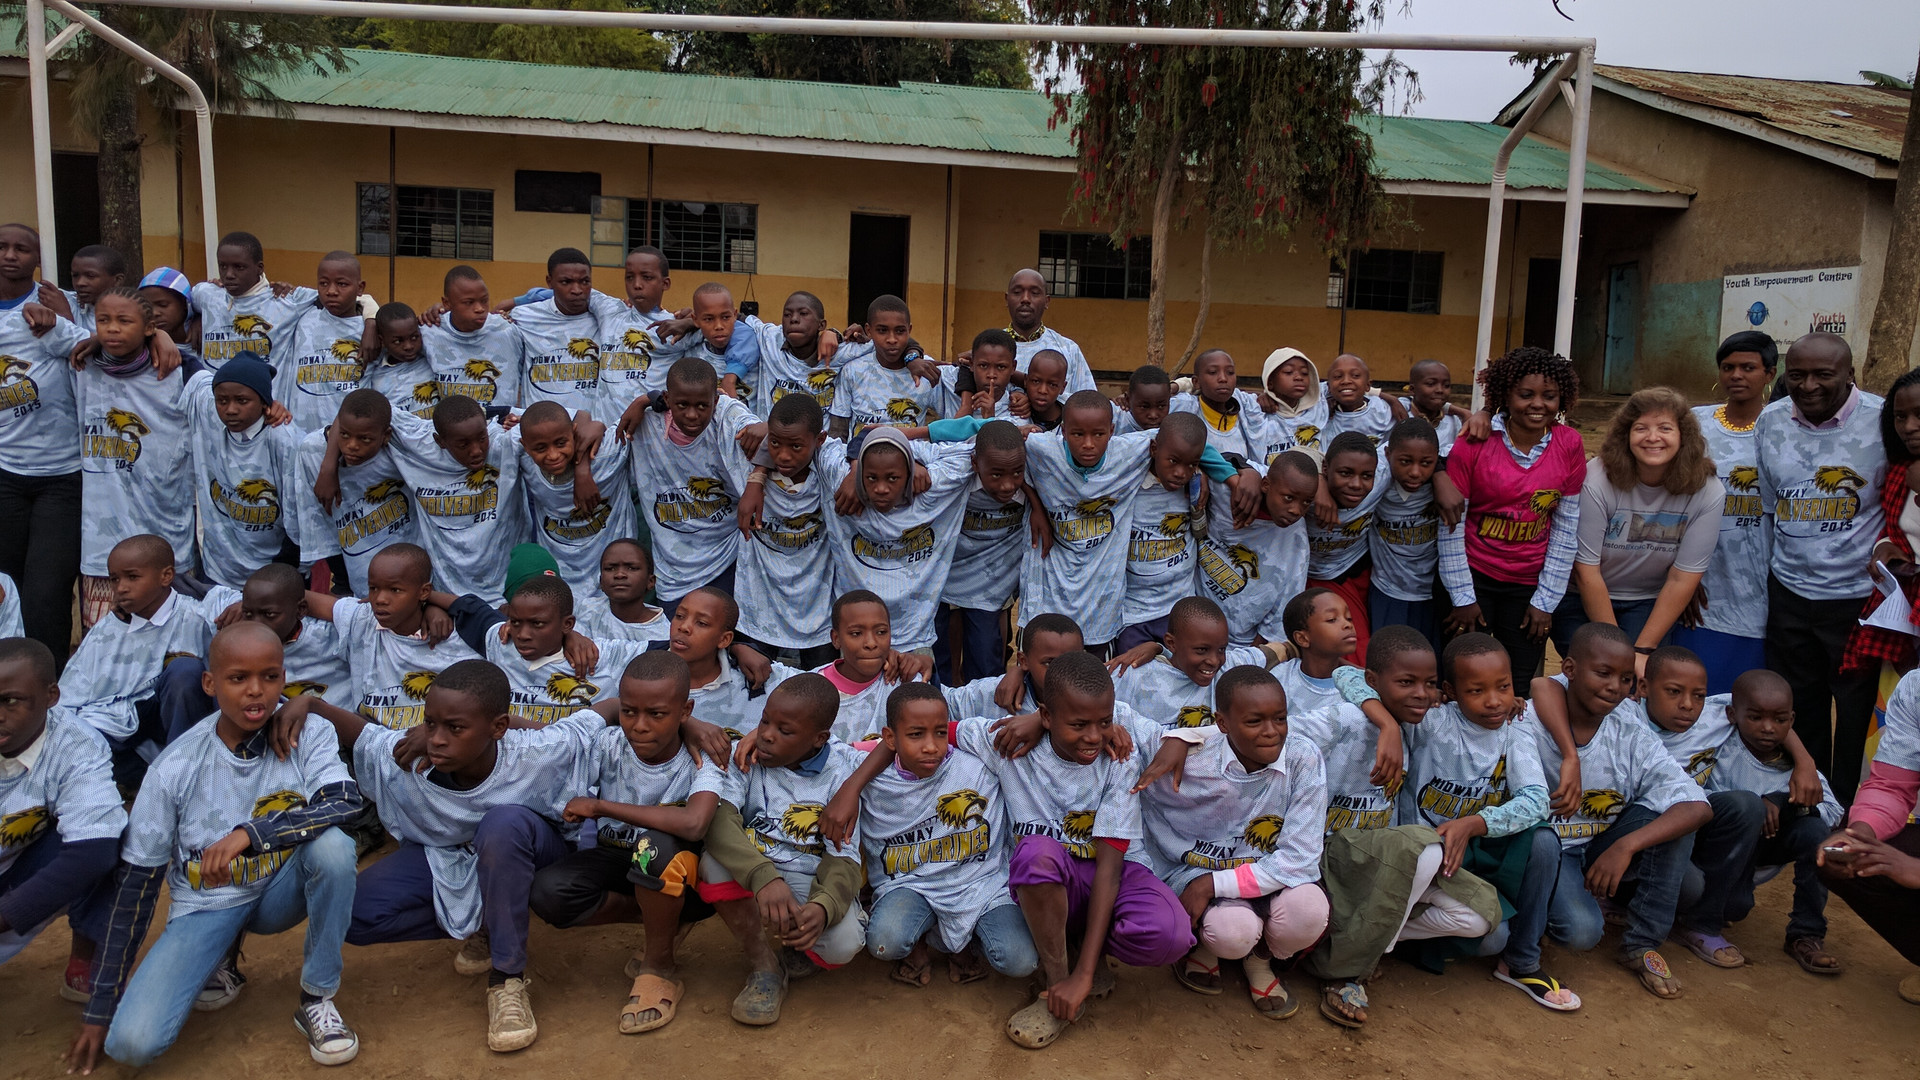 Sports shirts donated in Tanzania school